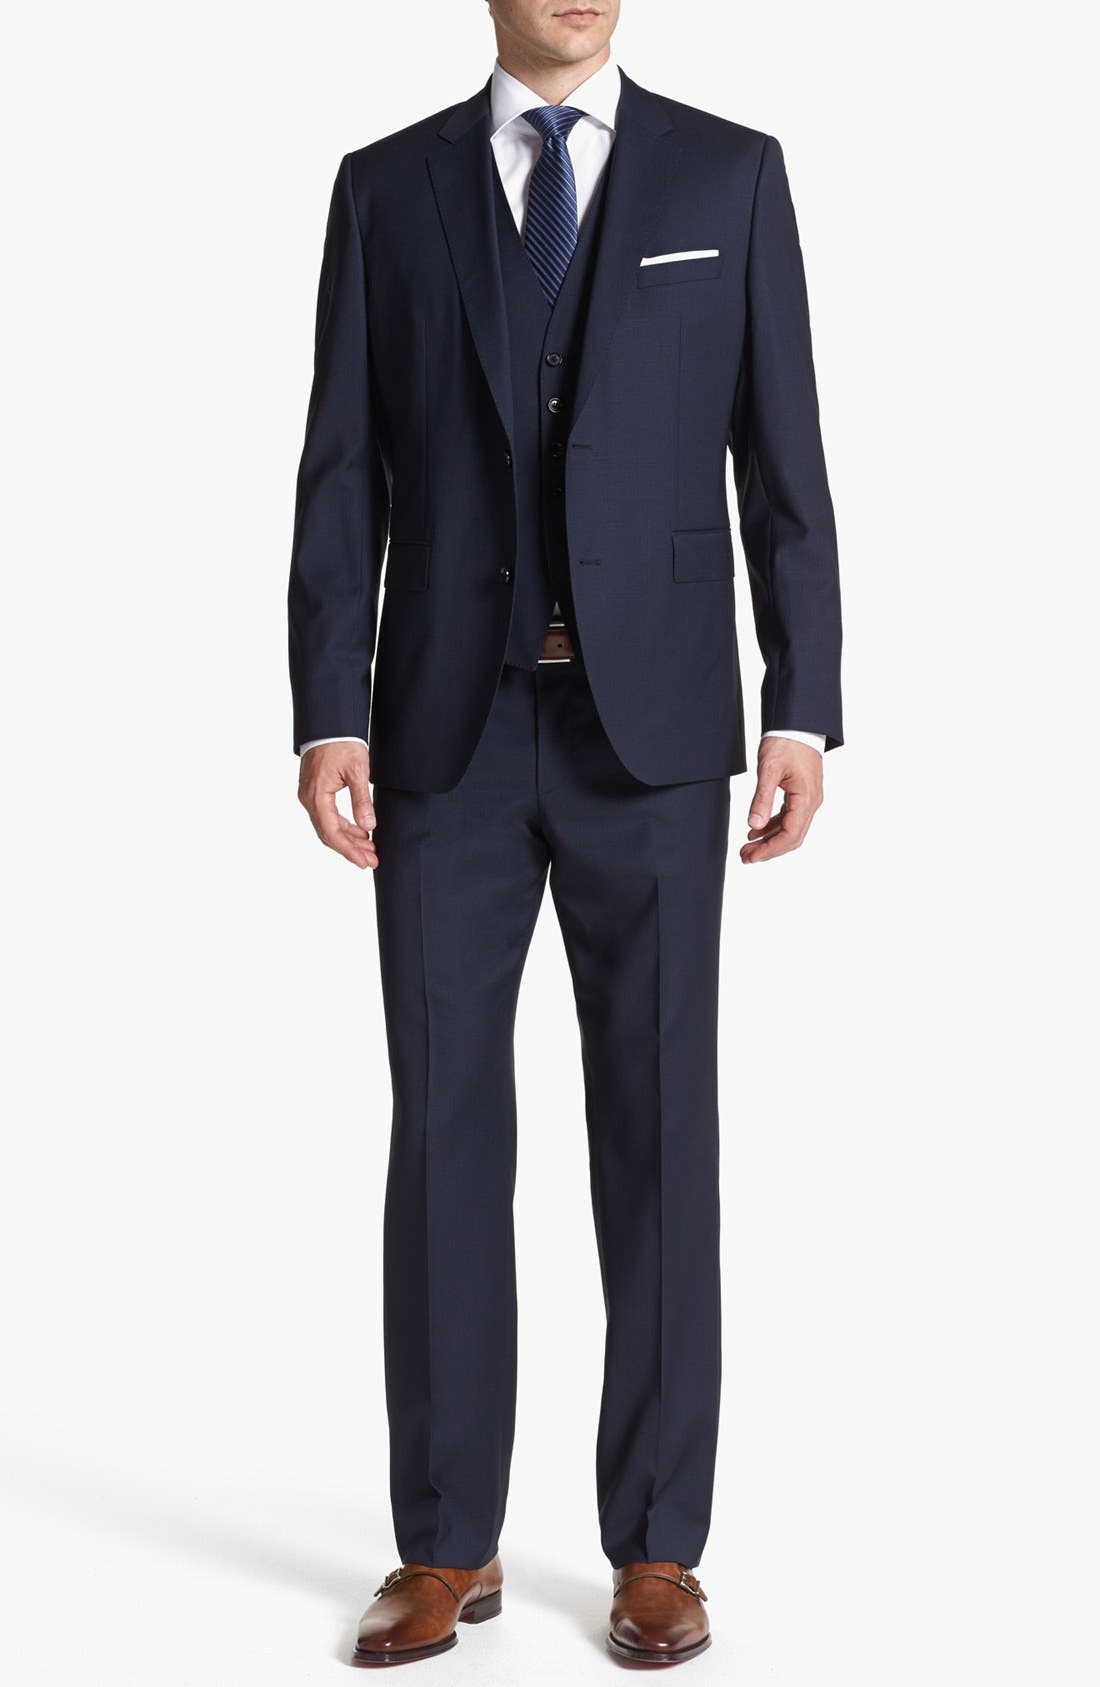 Main Image - BOSS HUGO BOSS 'James/Sharp' Trim Fit Three-Piece Suit